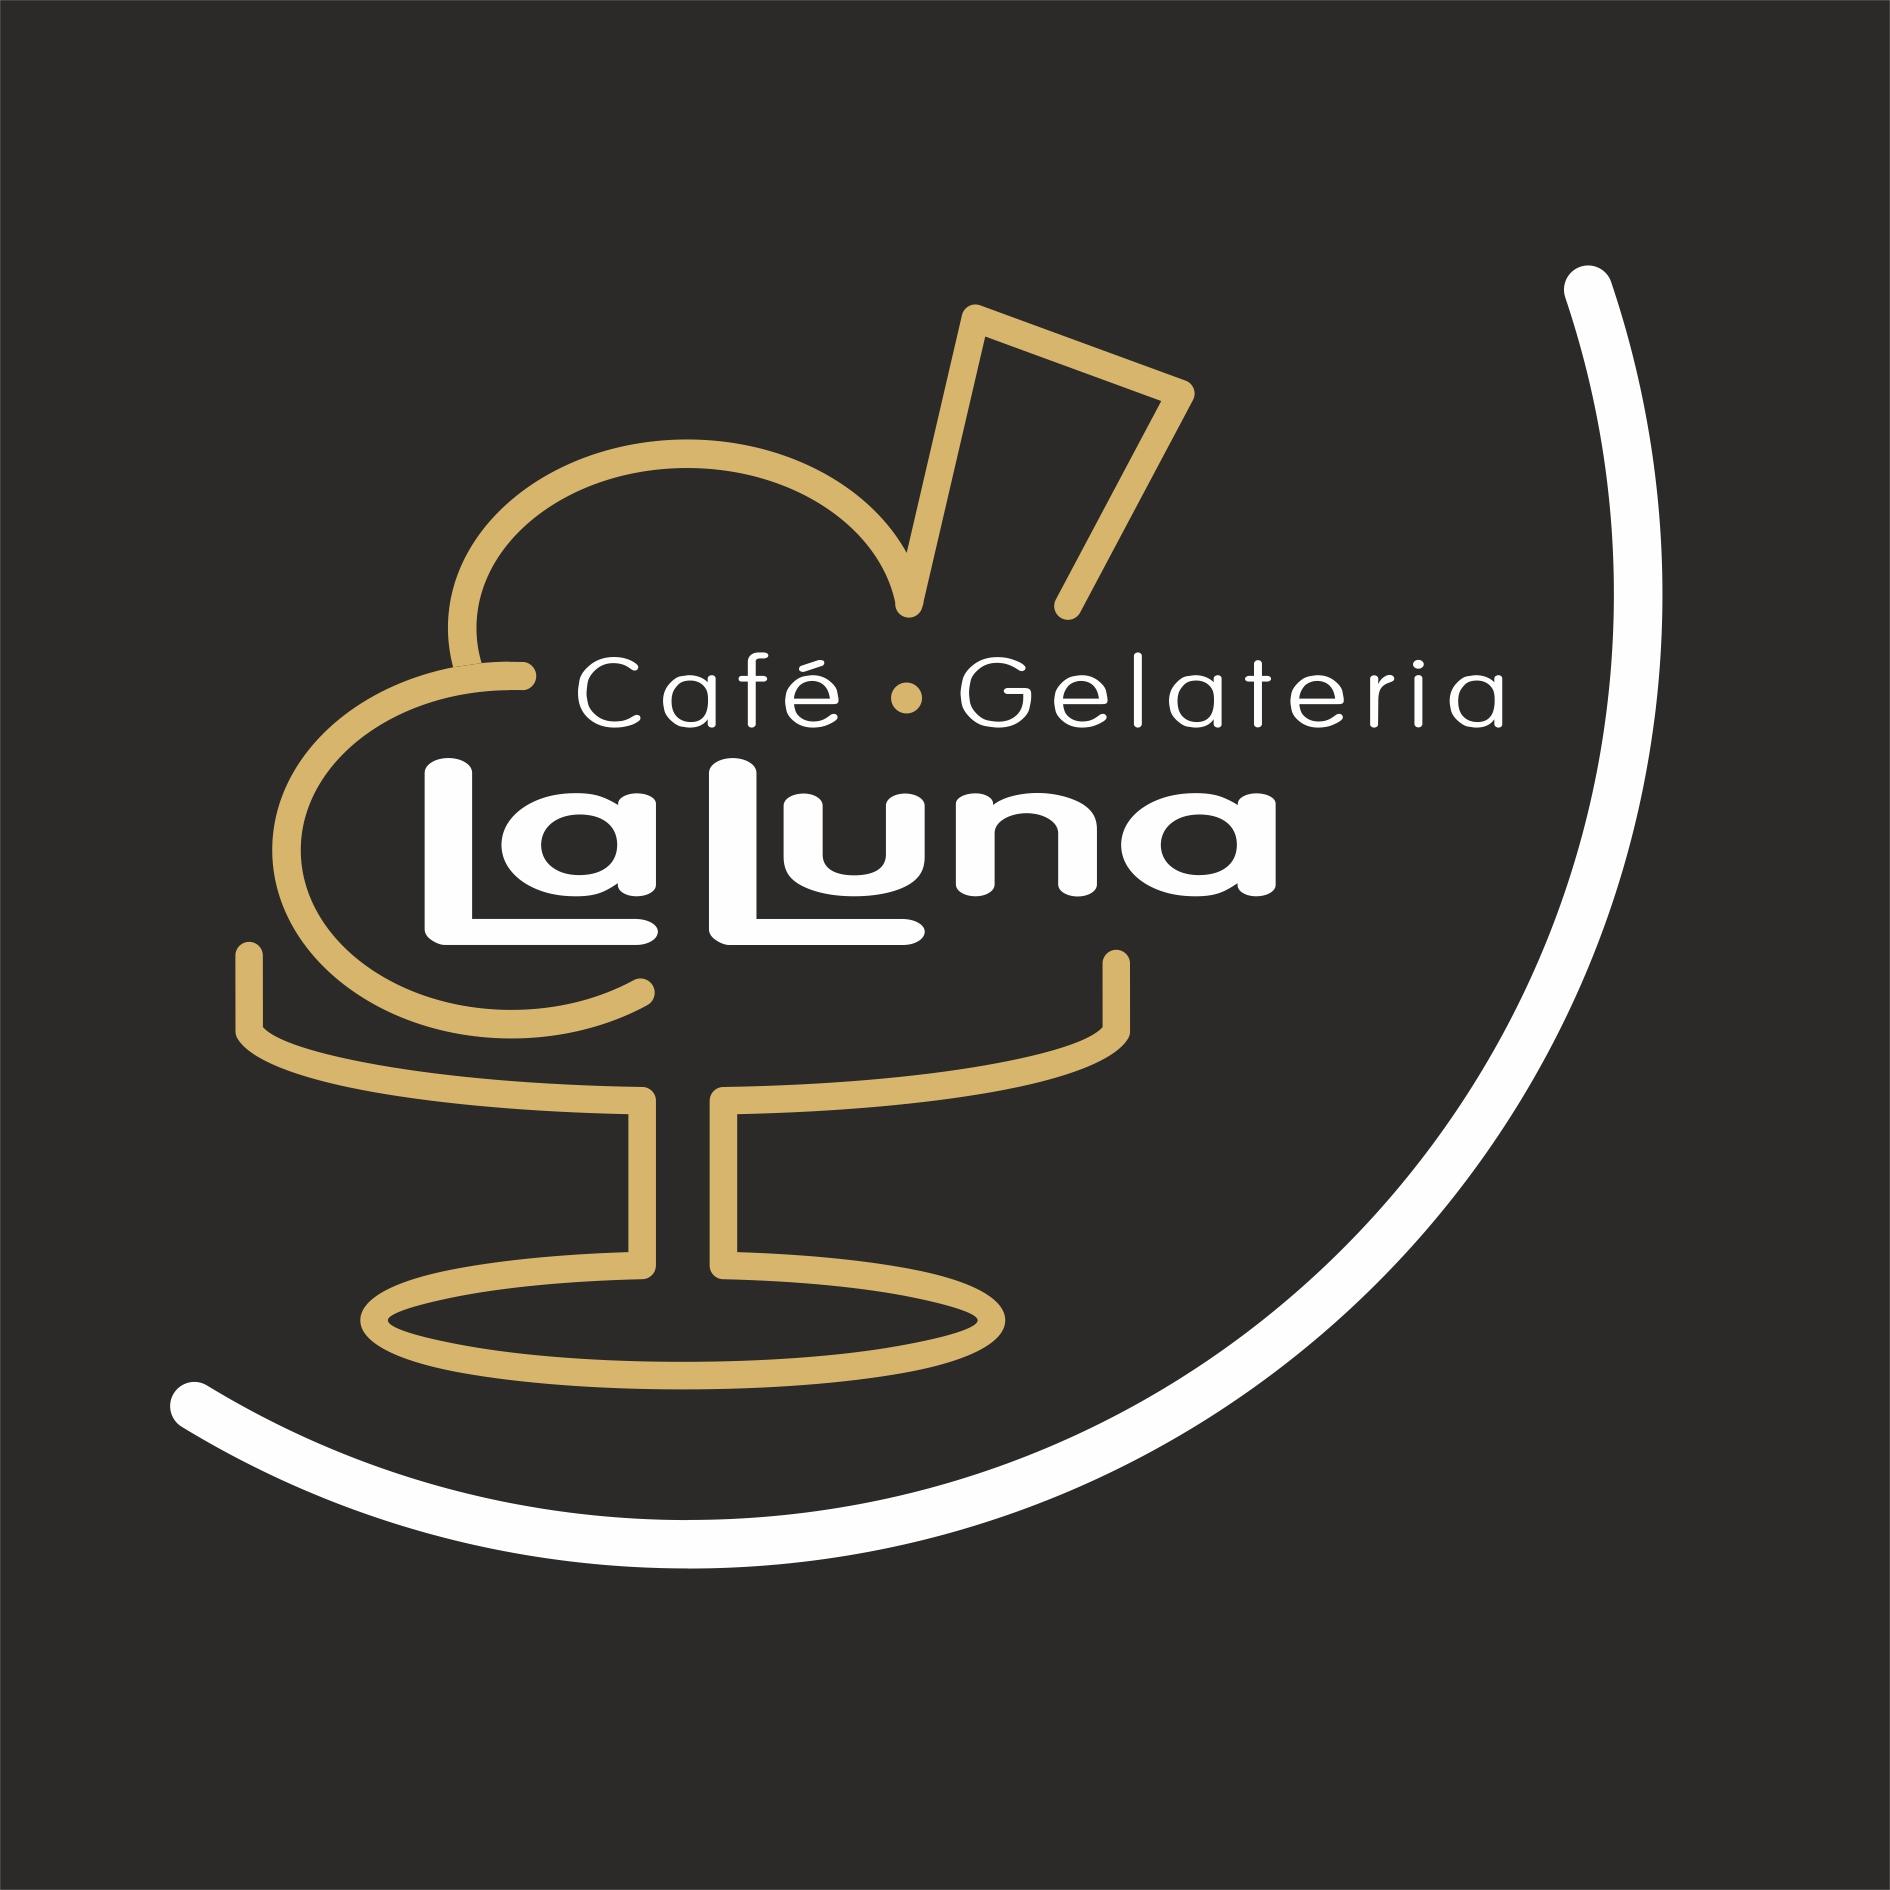 La Luna Partnernetz